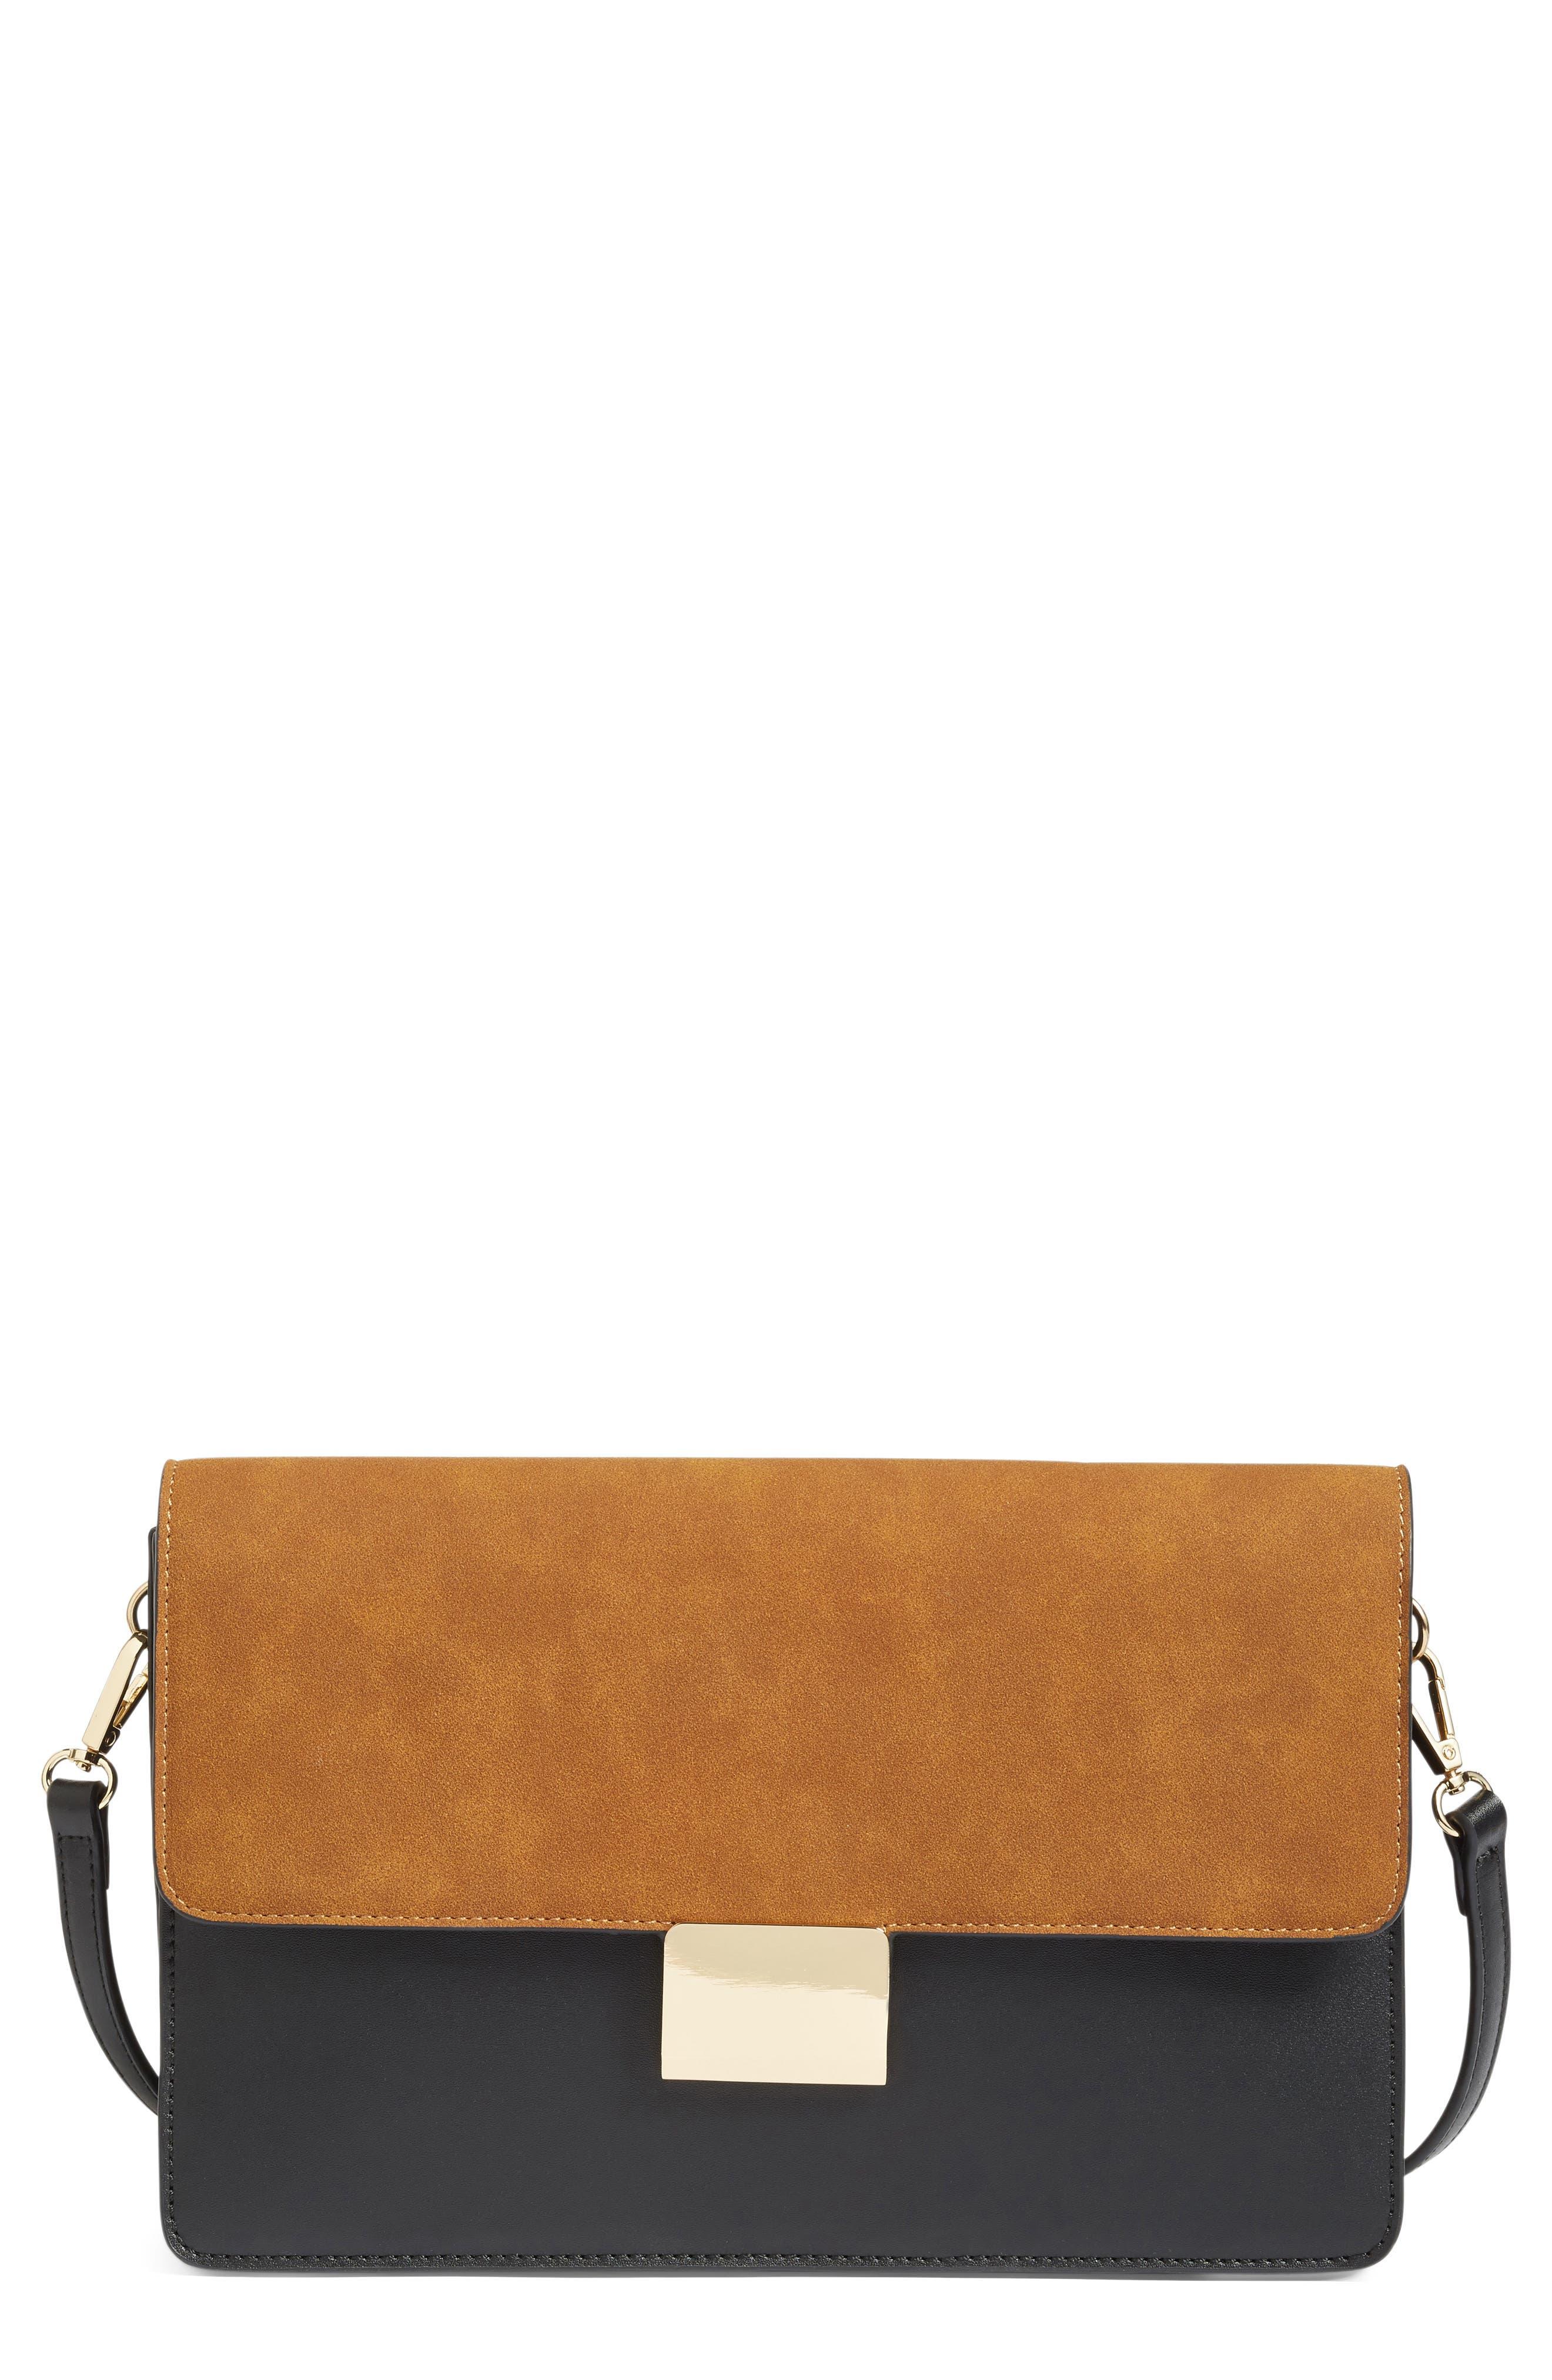 Leighton Colorblock Faux Leather Crossbody Bag,                             Main thumbnail 1, color,                             Black/Cognac